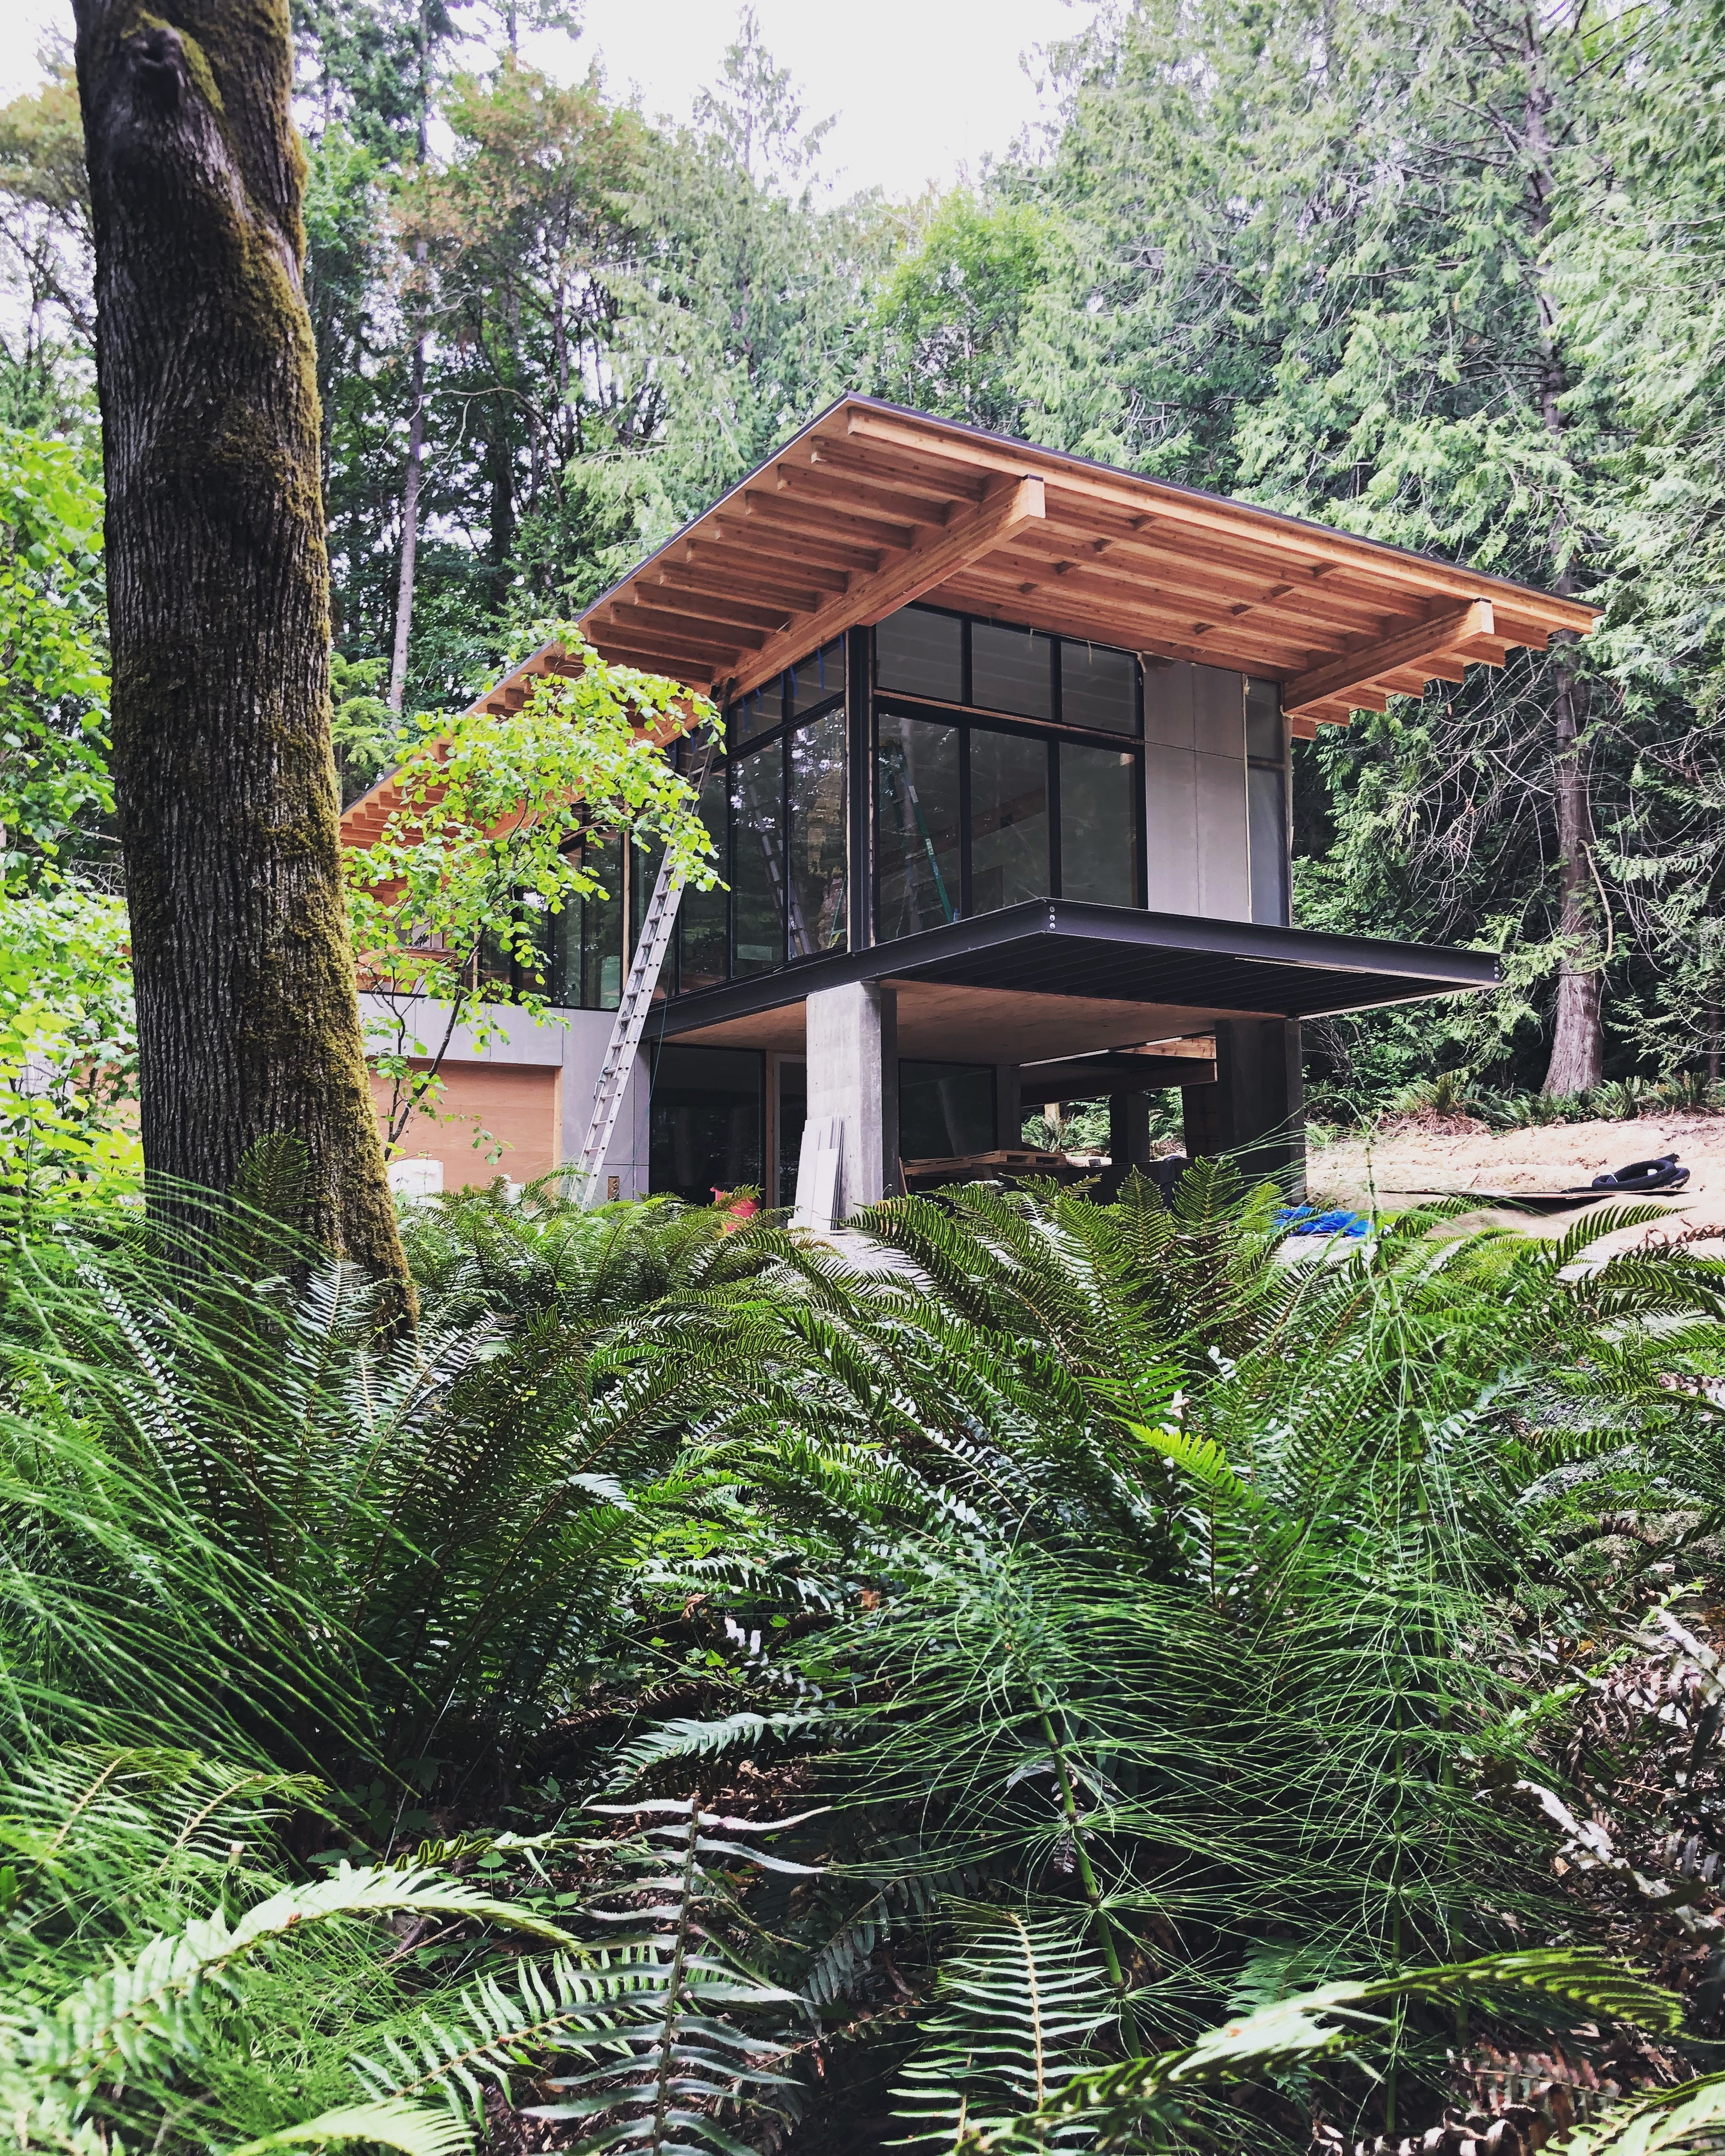 Forest House - Eerkes Architects - Juara